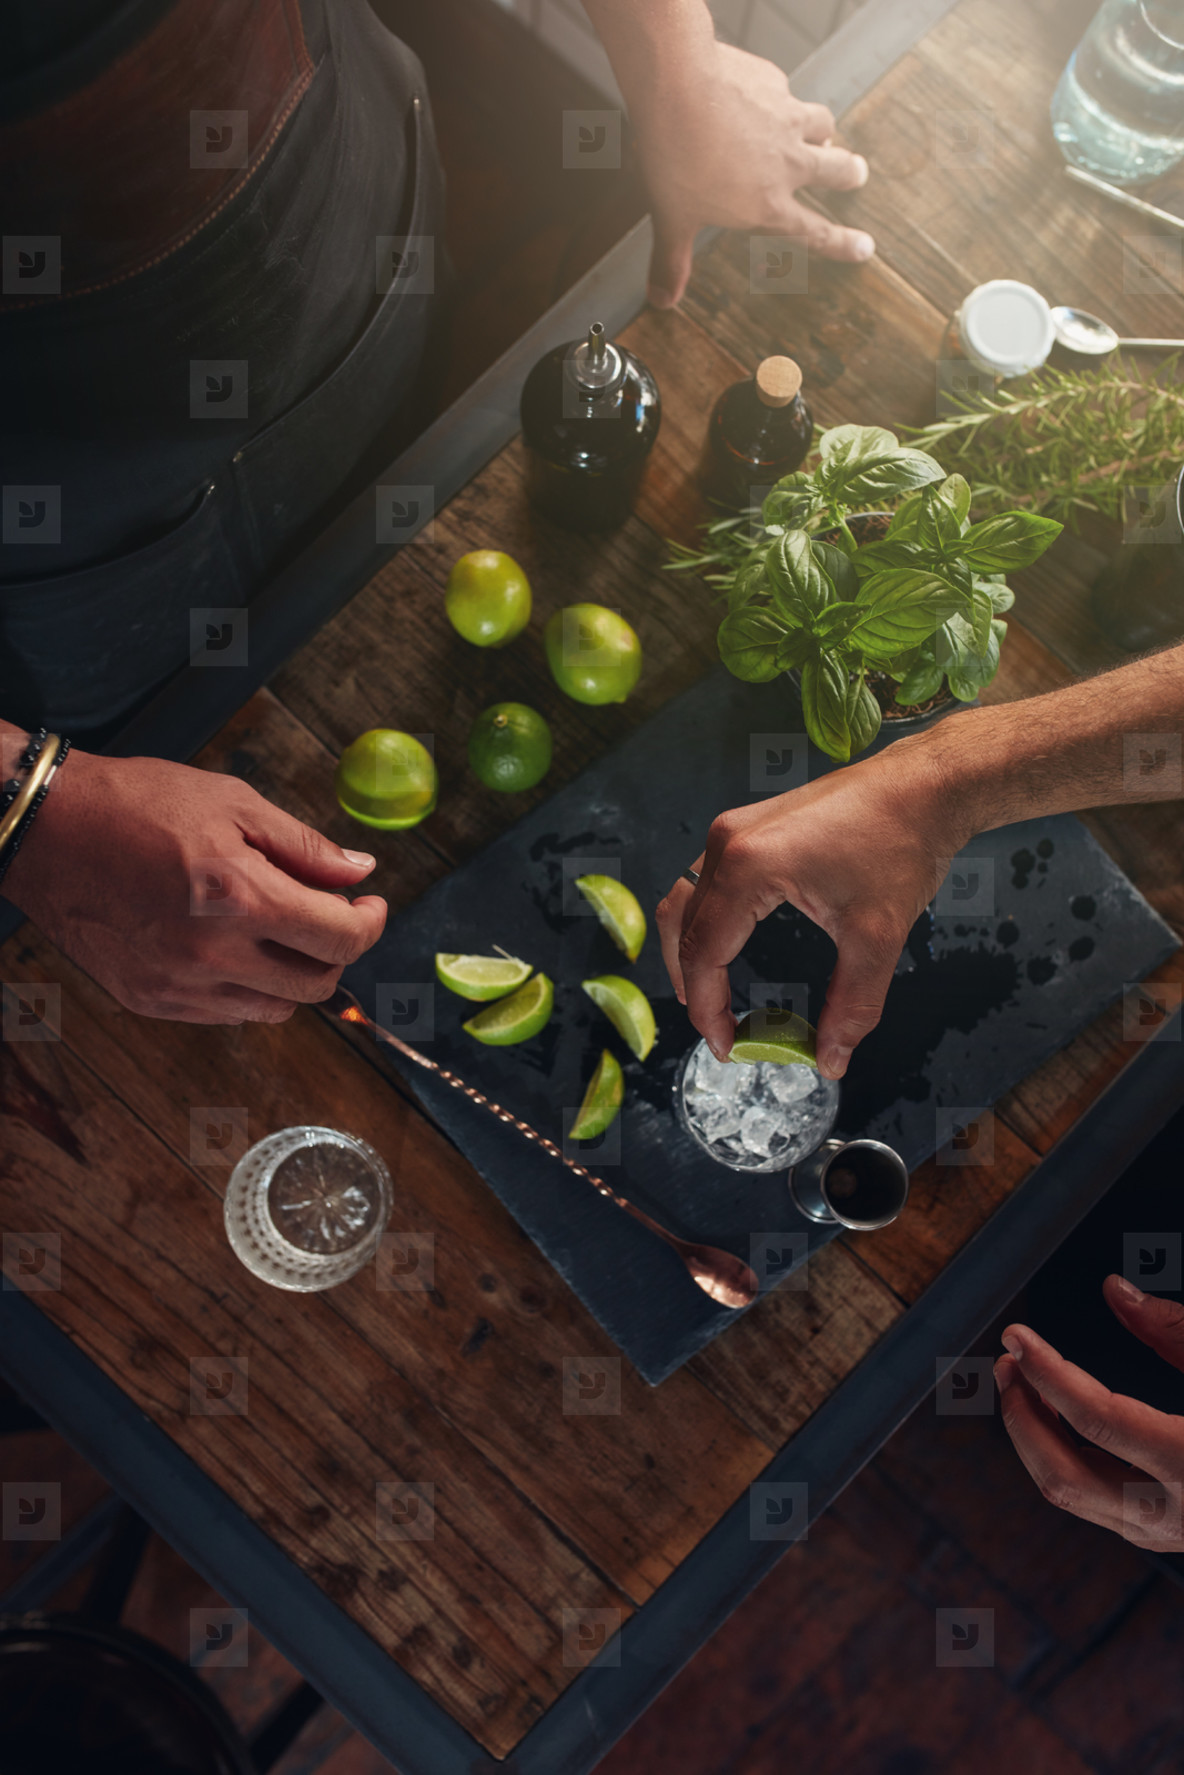 Barmen preparing refreshing new cocktail